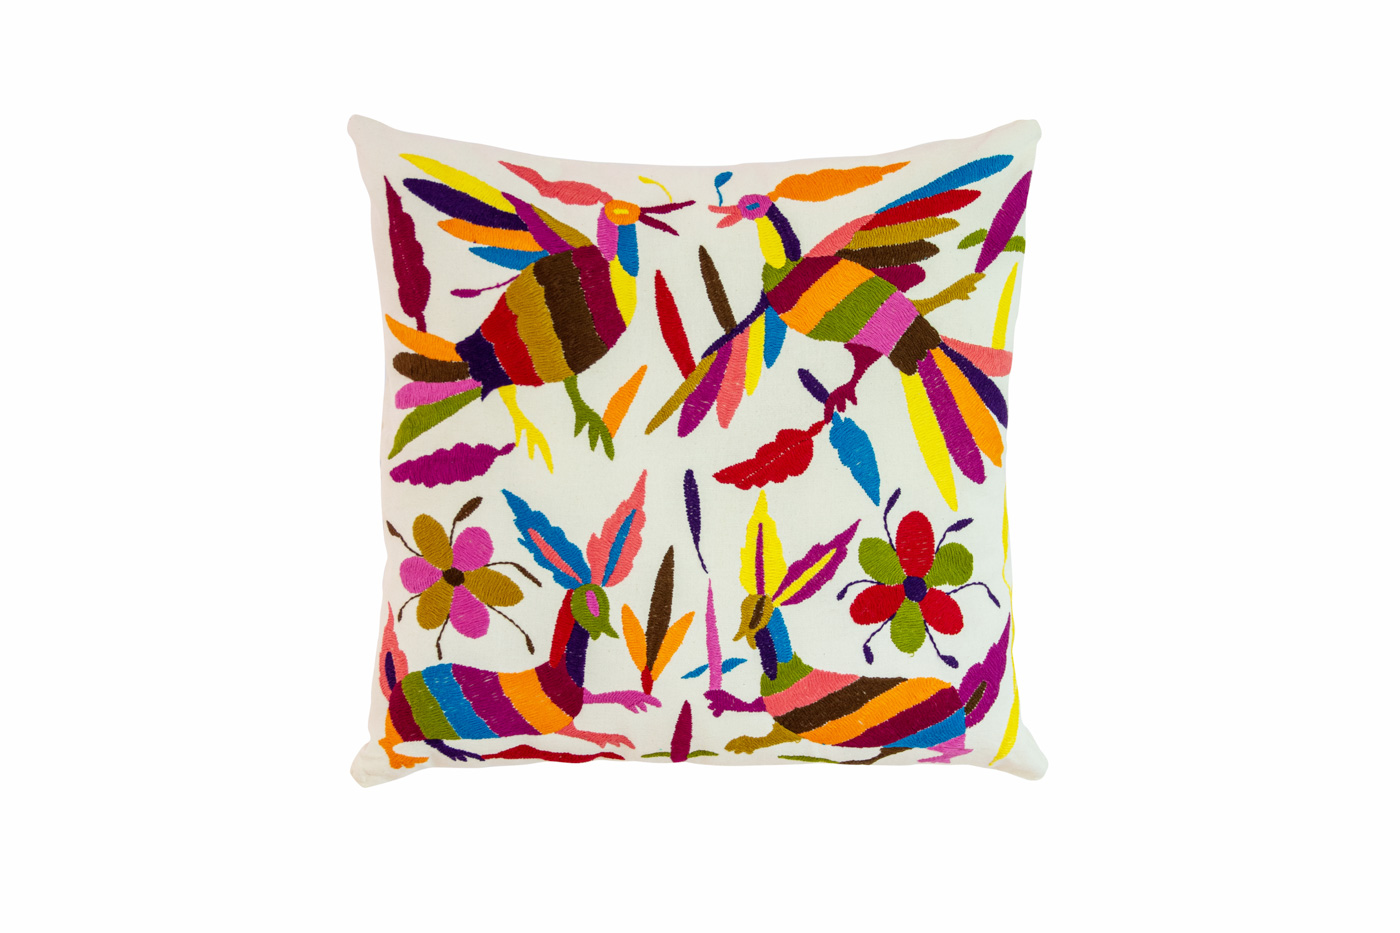 Otomi cushion multicolored birds